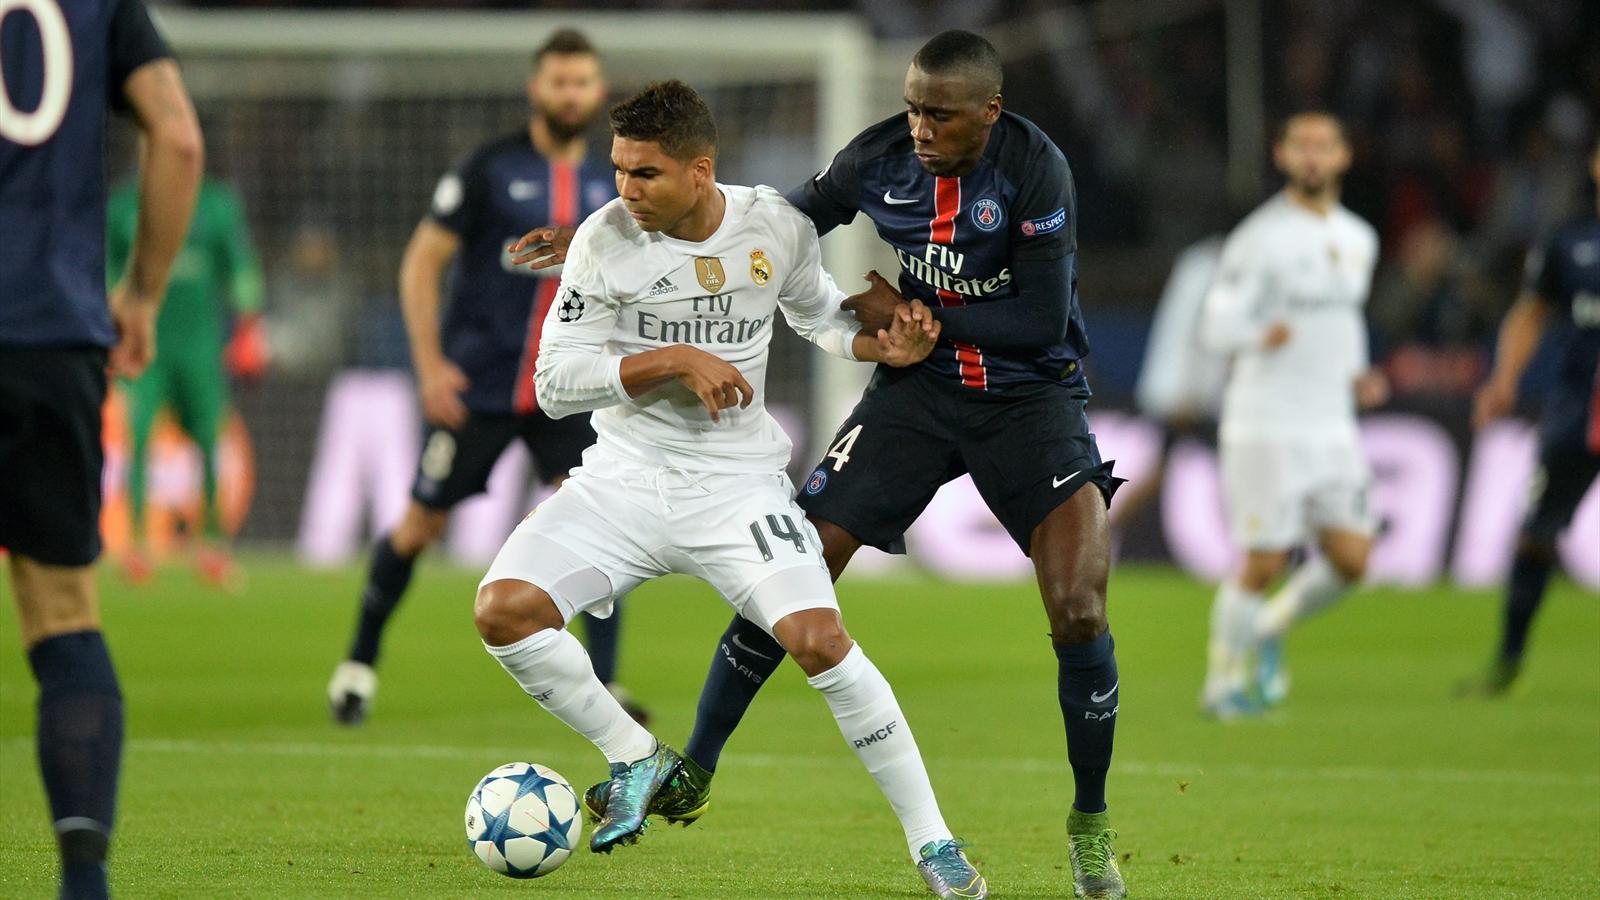 Casemiro au duel avec Blaise Matuidi lors de PSG-Real Madrid